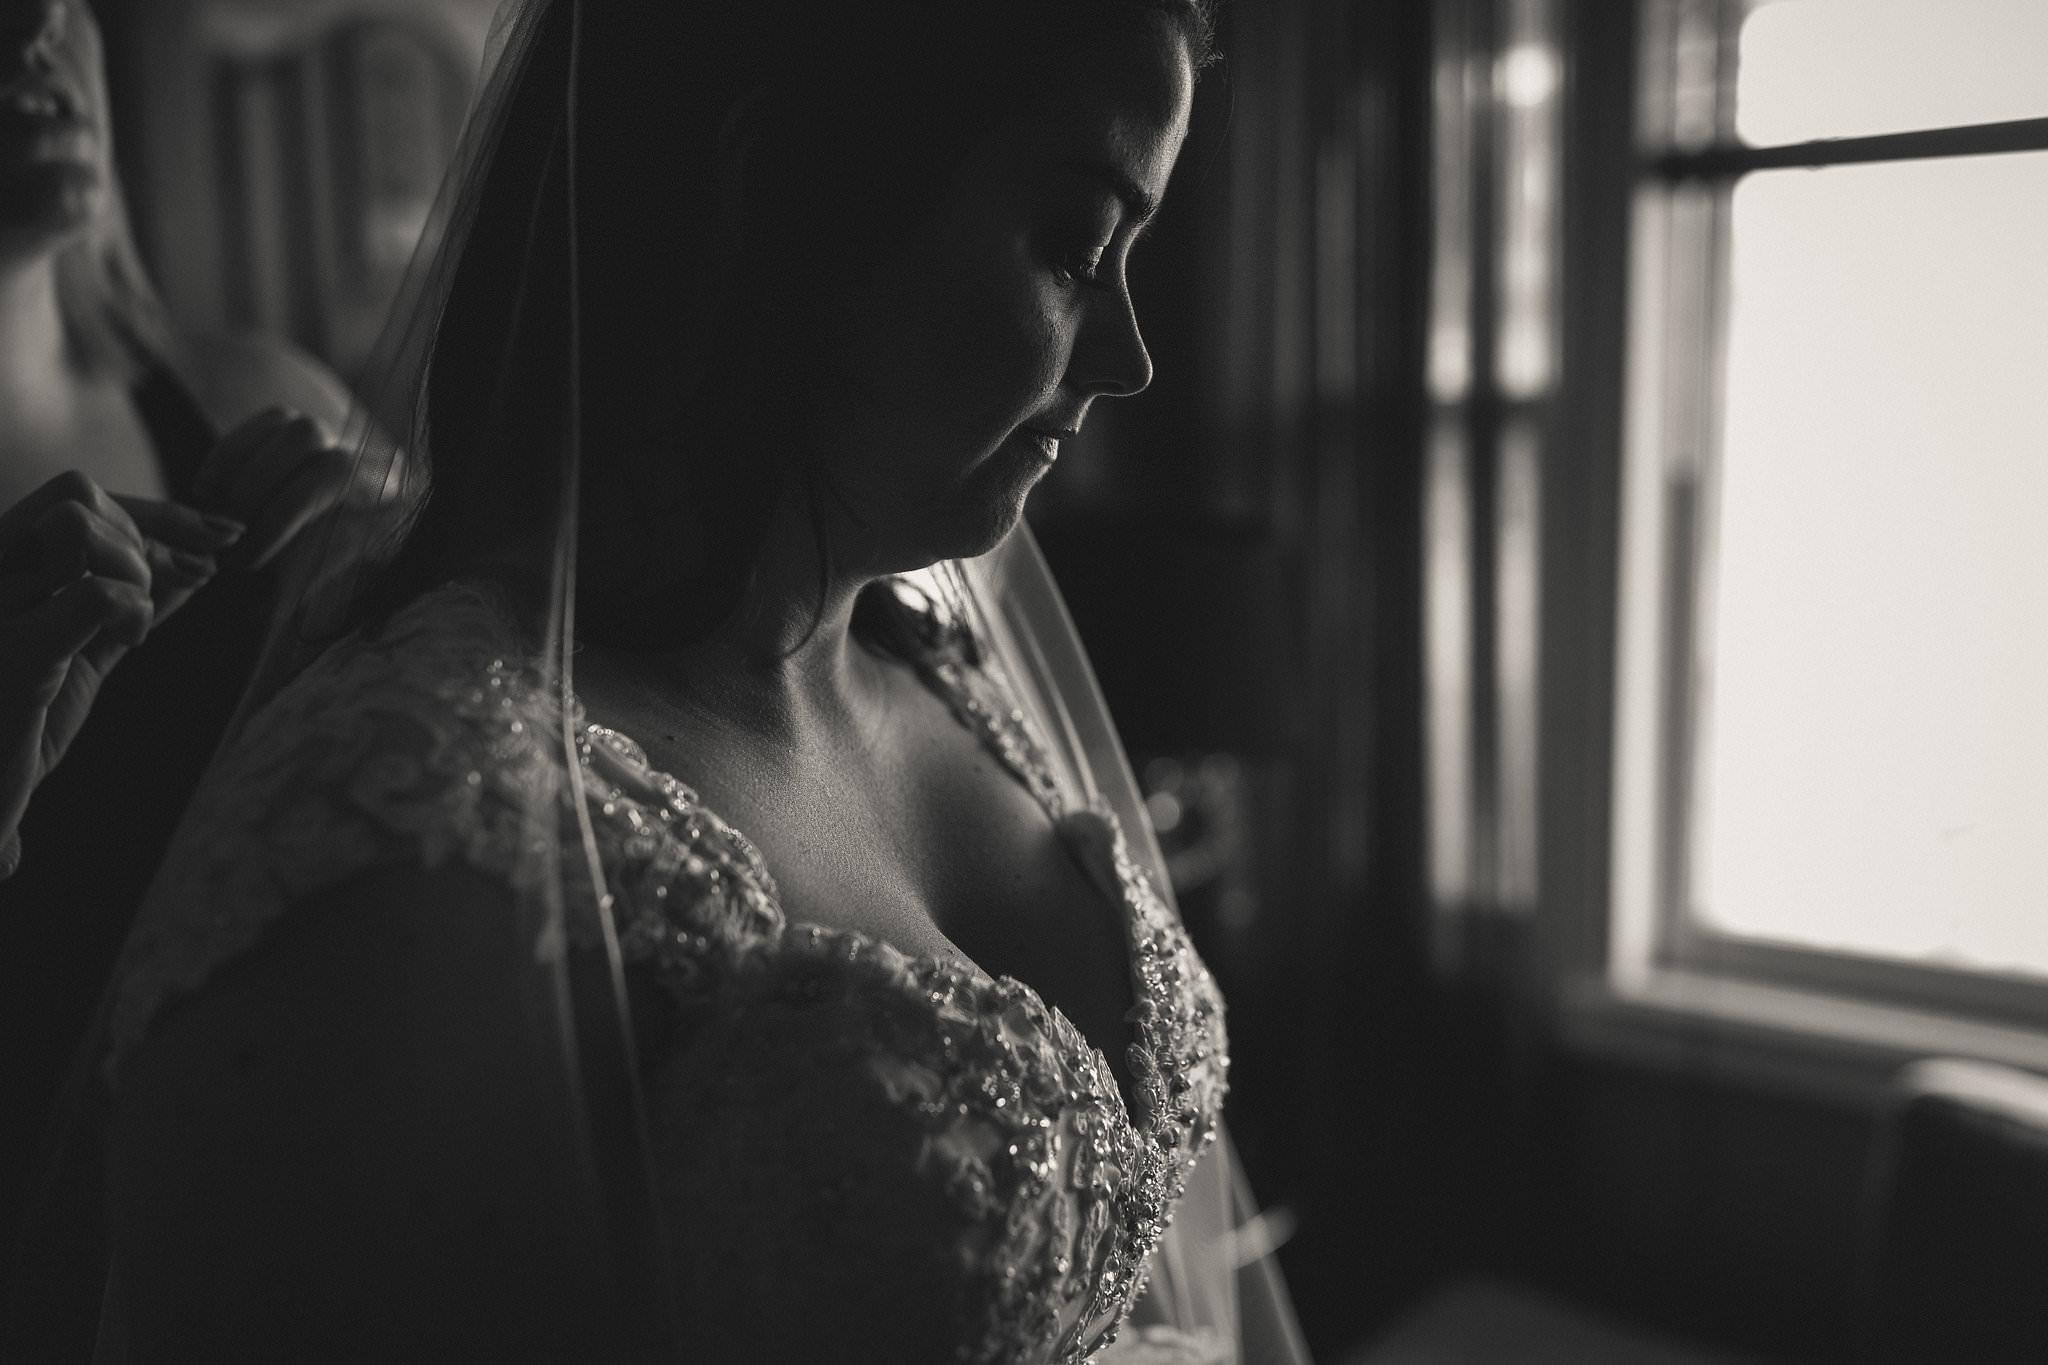 Kristen Adam Kindred Loft Whitby Wedding Photos 54 - Durham Wedding Photographer: Kindred Loft Wedding Photos